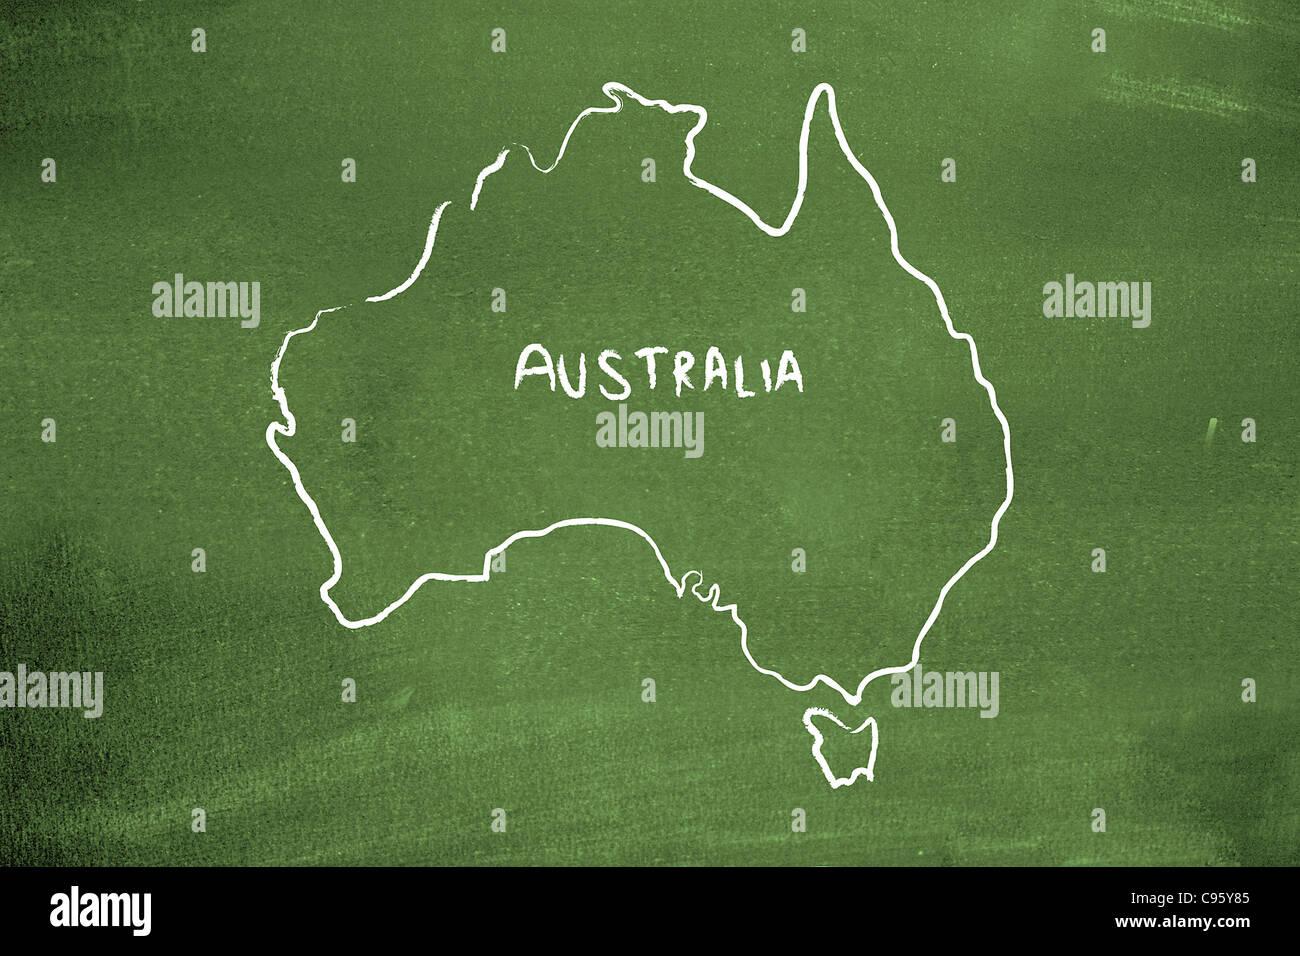 Australia on a blackboard - Stock Image